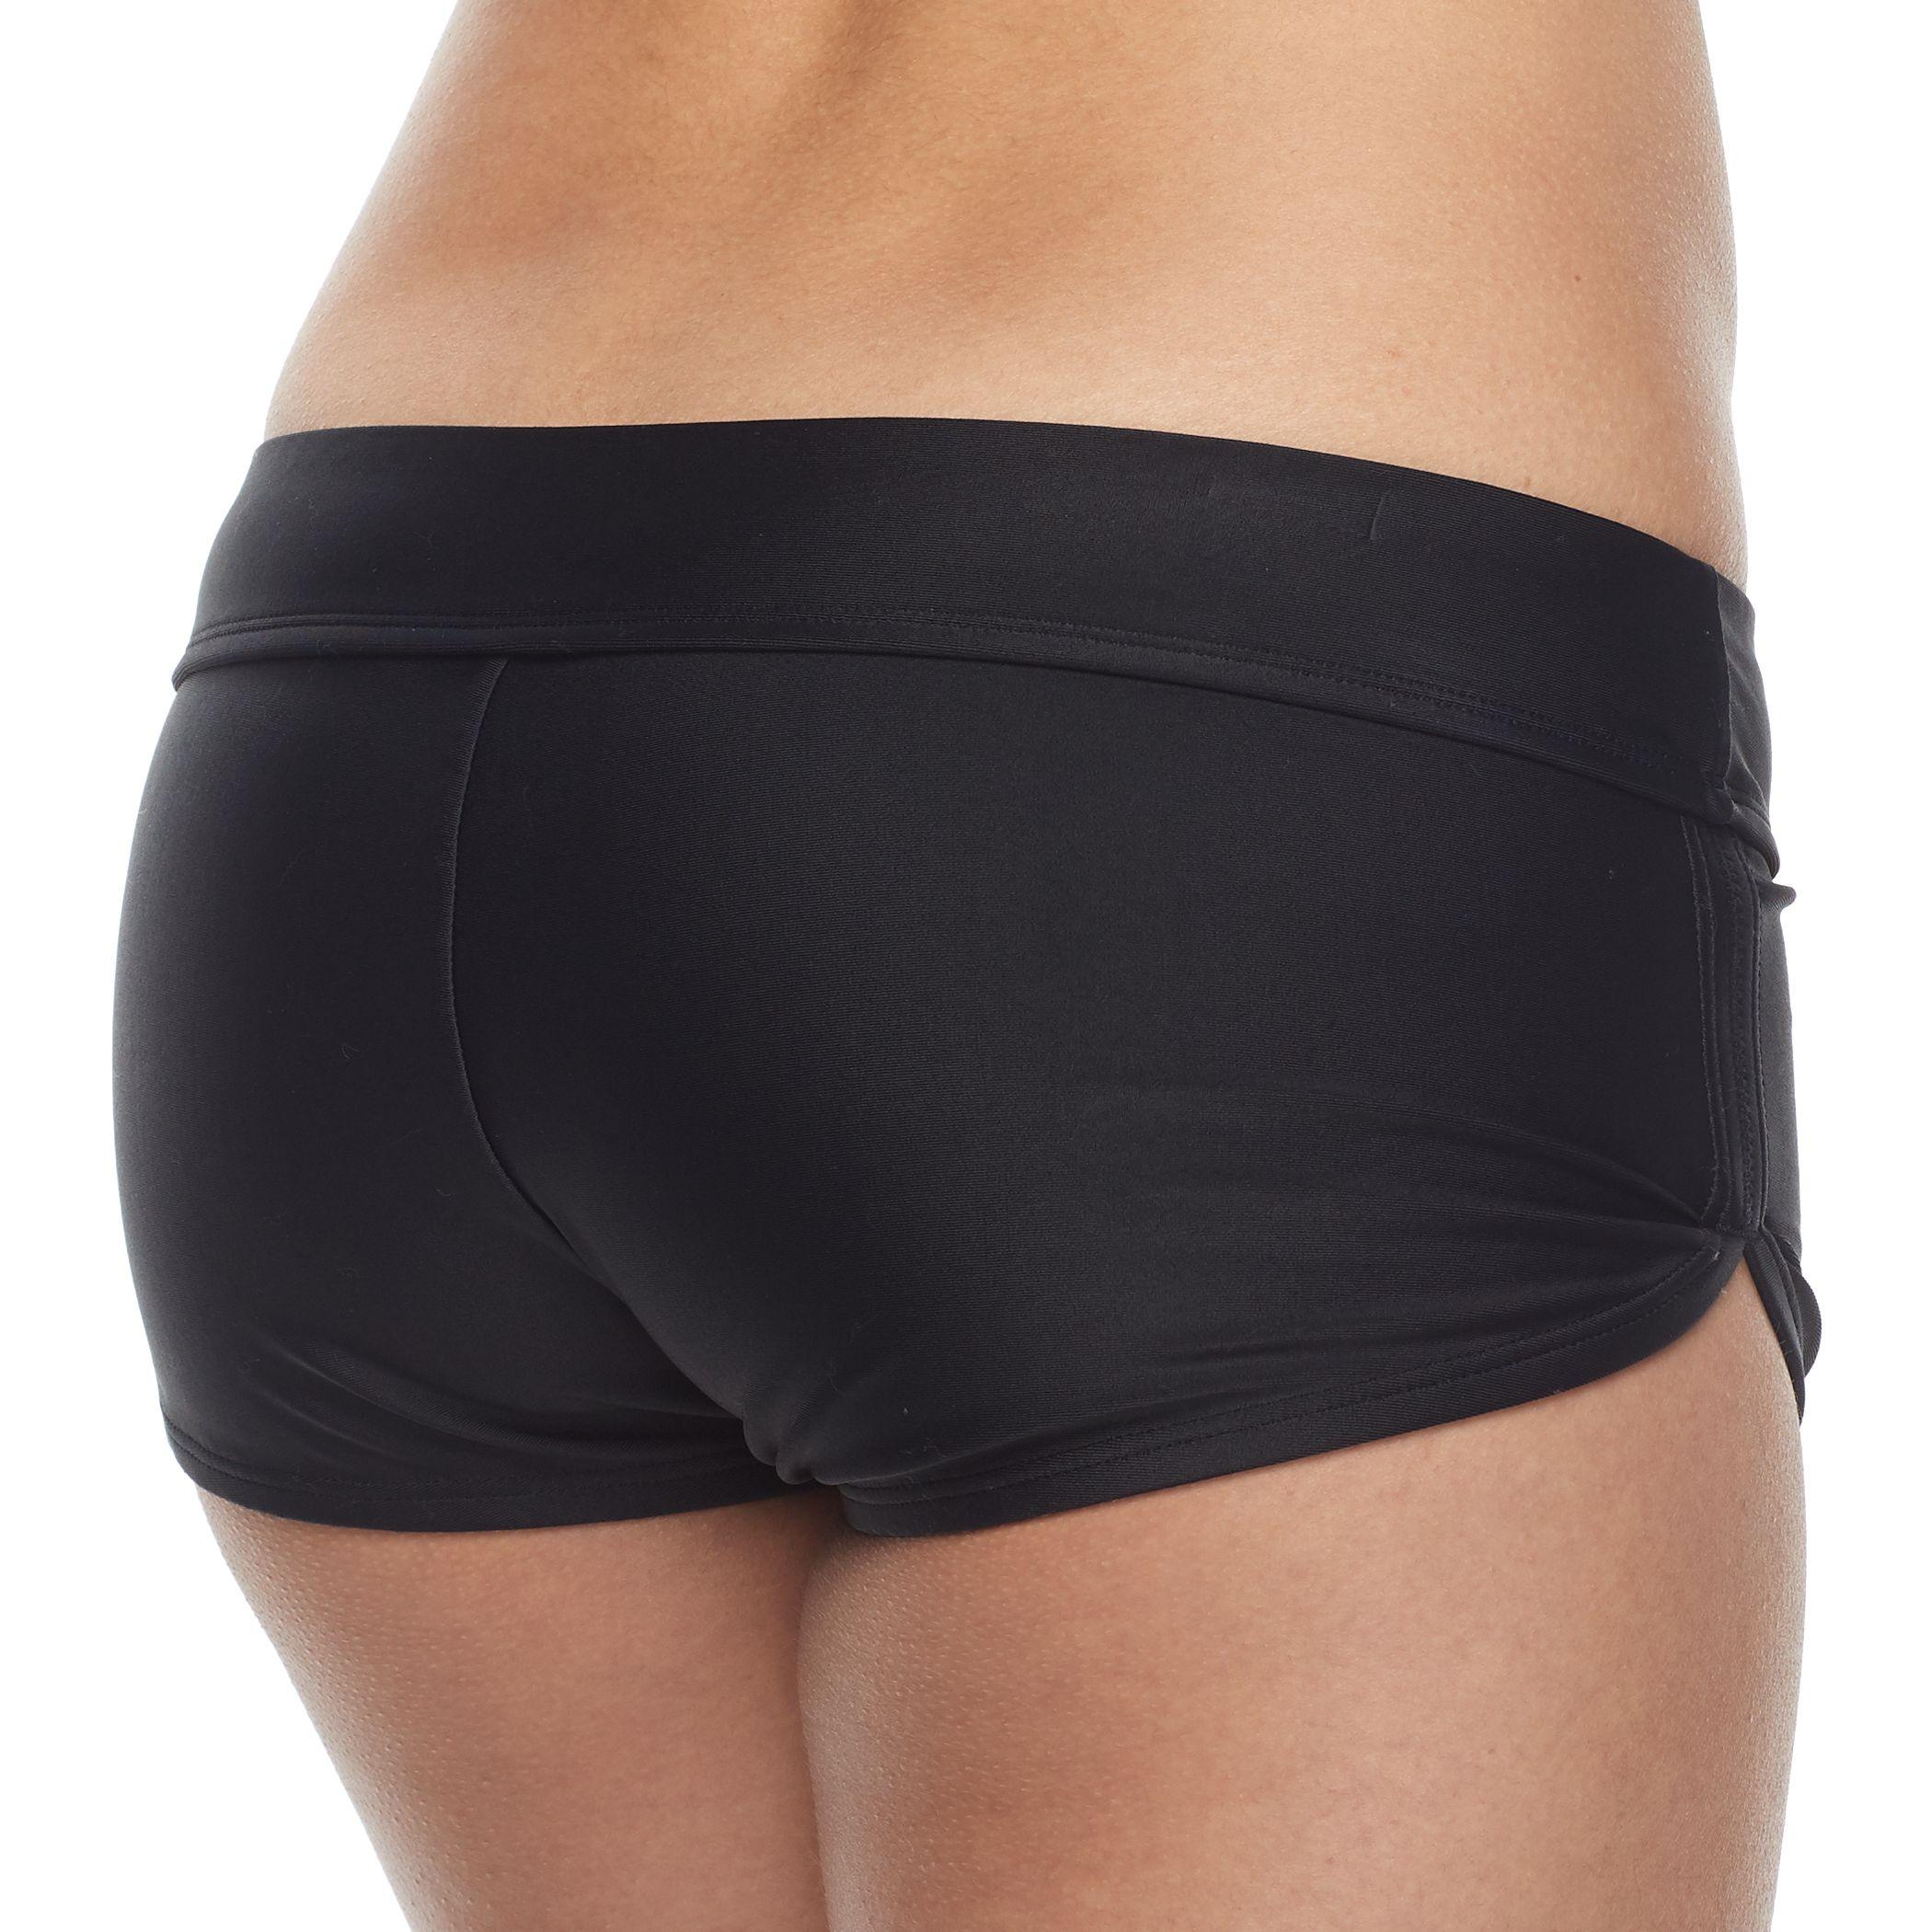 7c57d7b07f4 Womens Adidas Swim Short Swimsuit Bottoms - Swimsuits, Clothing | Kohl's